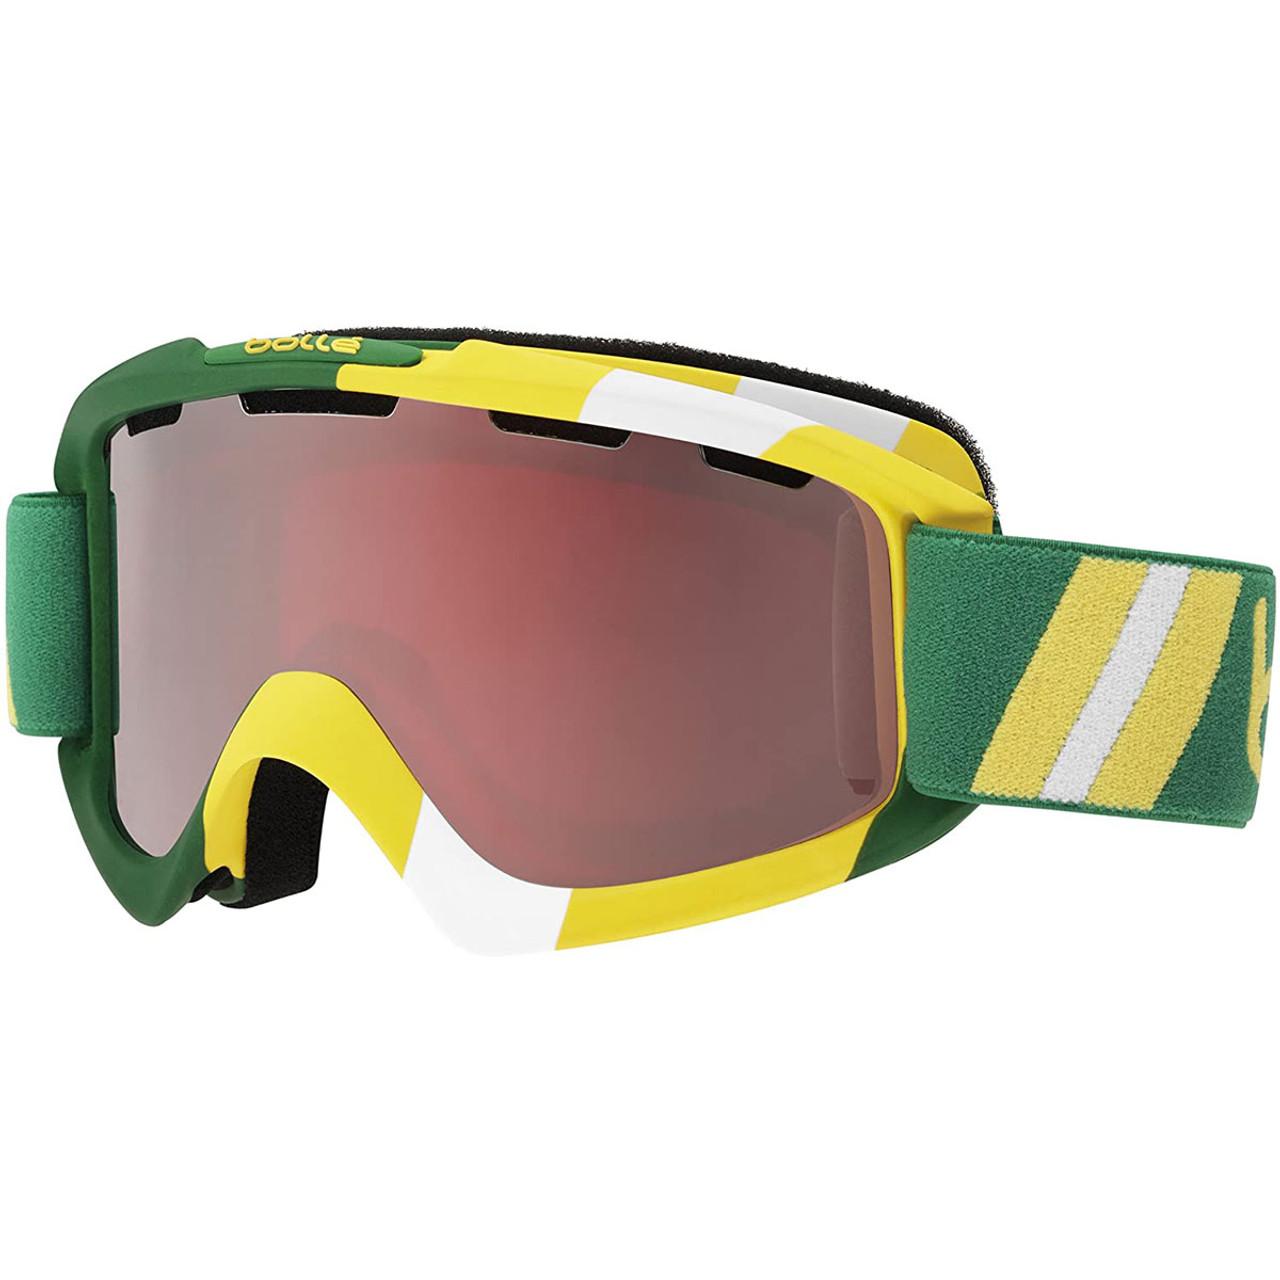 Bolle Nova Limited Edition Snow Goggles - Australia